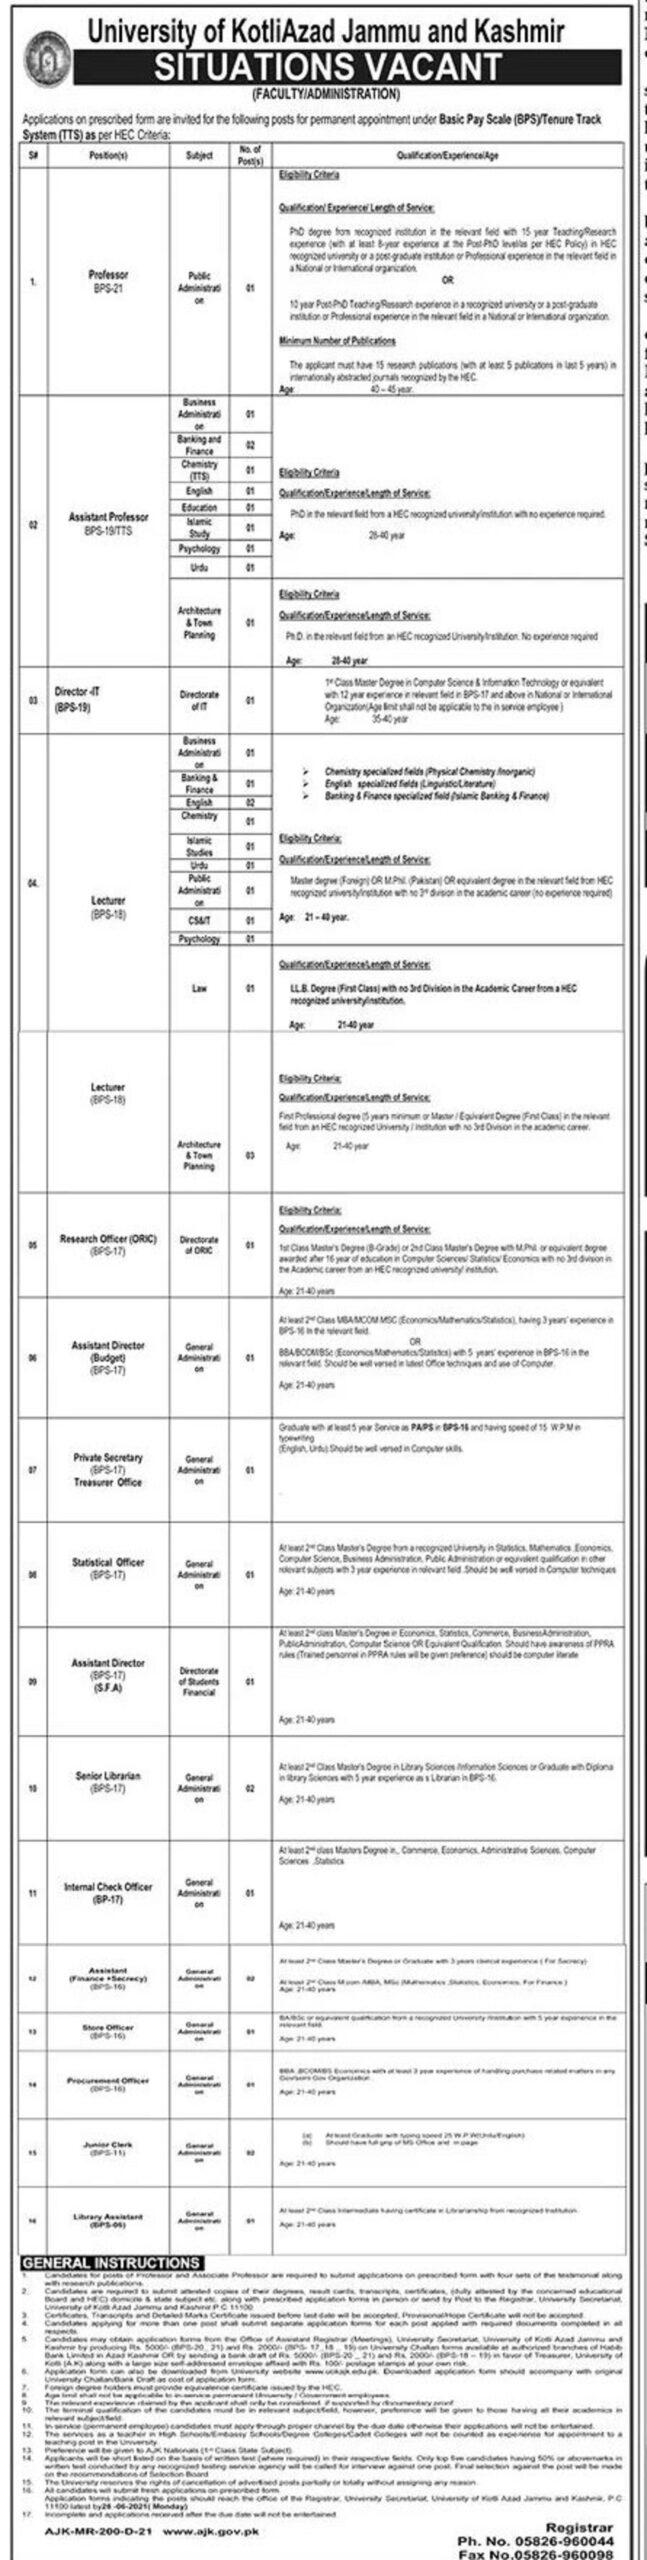 University of Kotli Azad Jammu and Kashmir Latest Jobs 2021